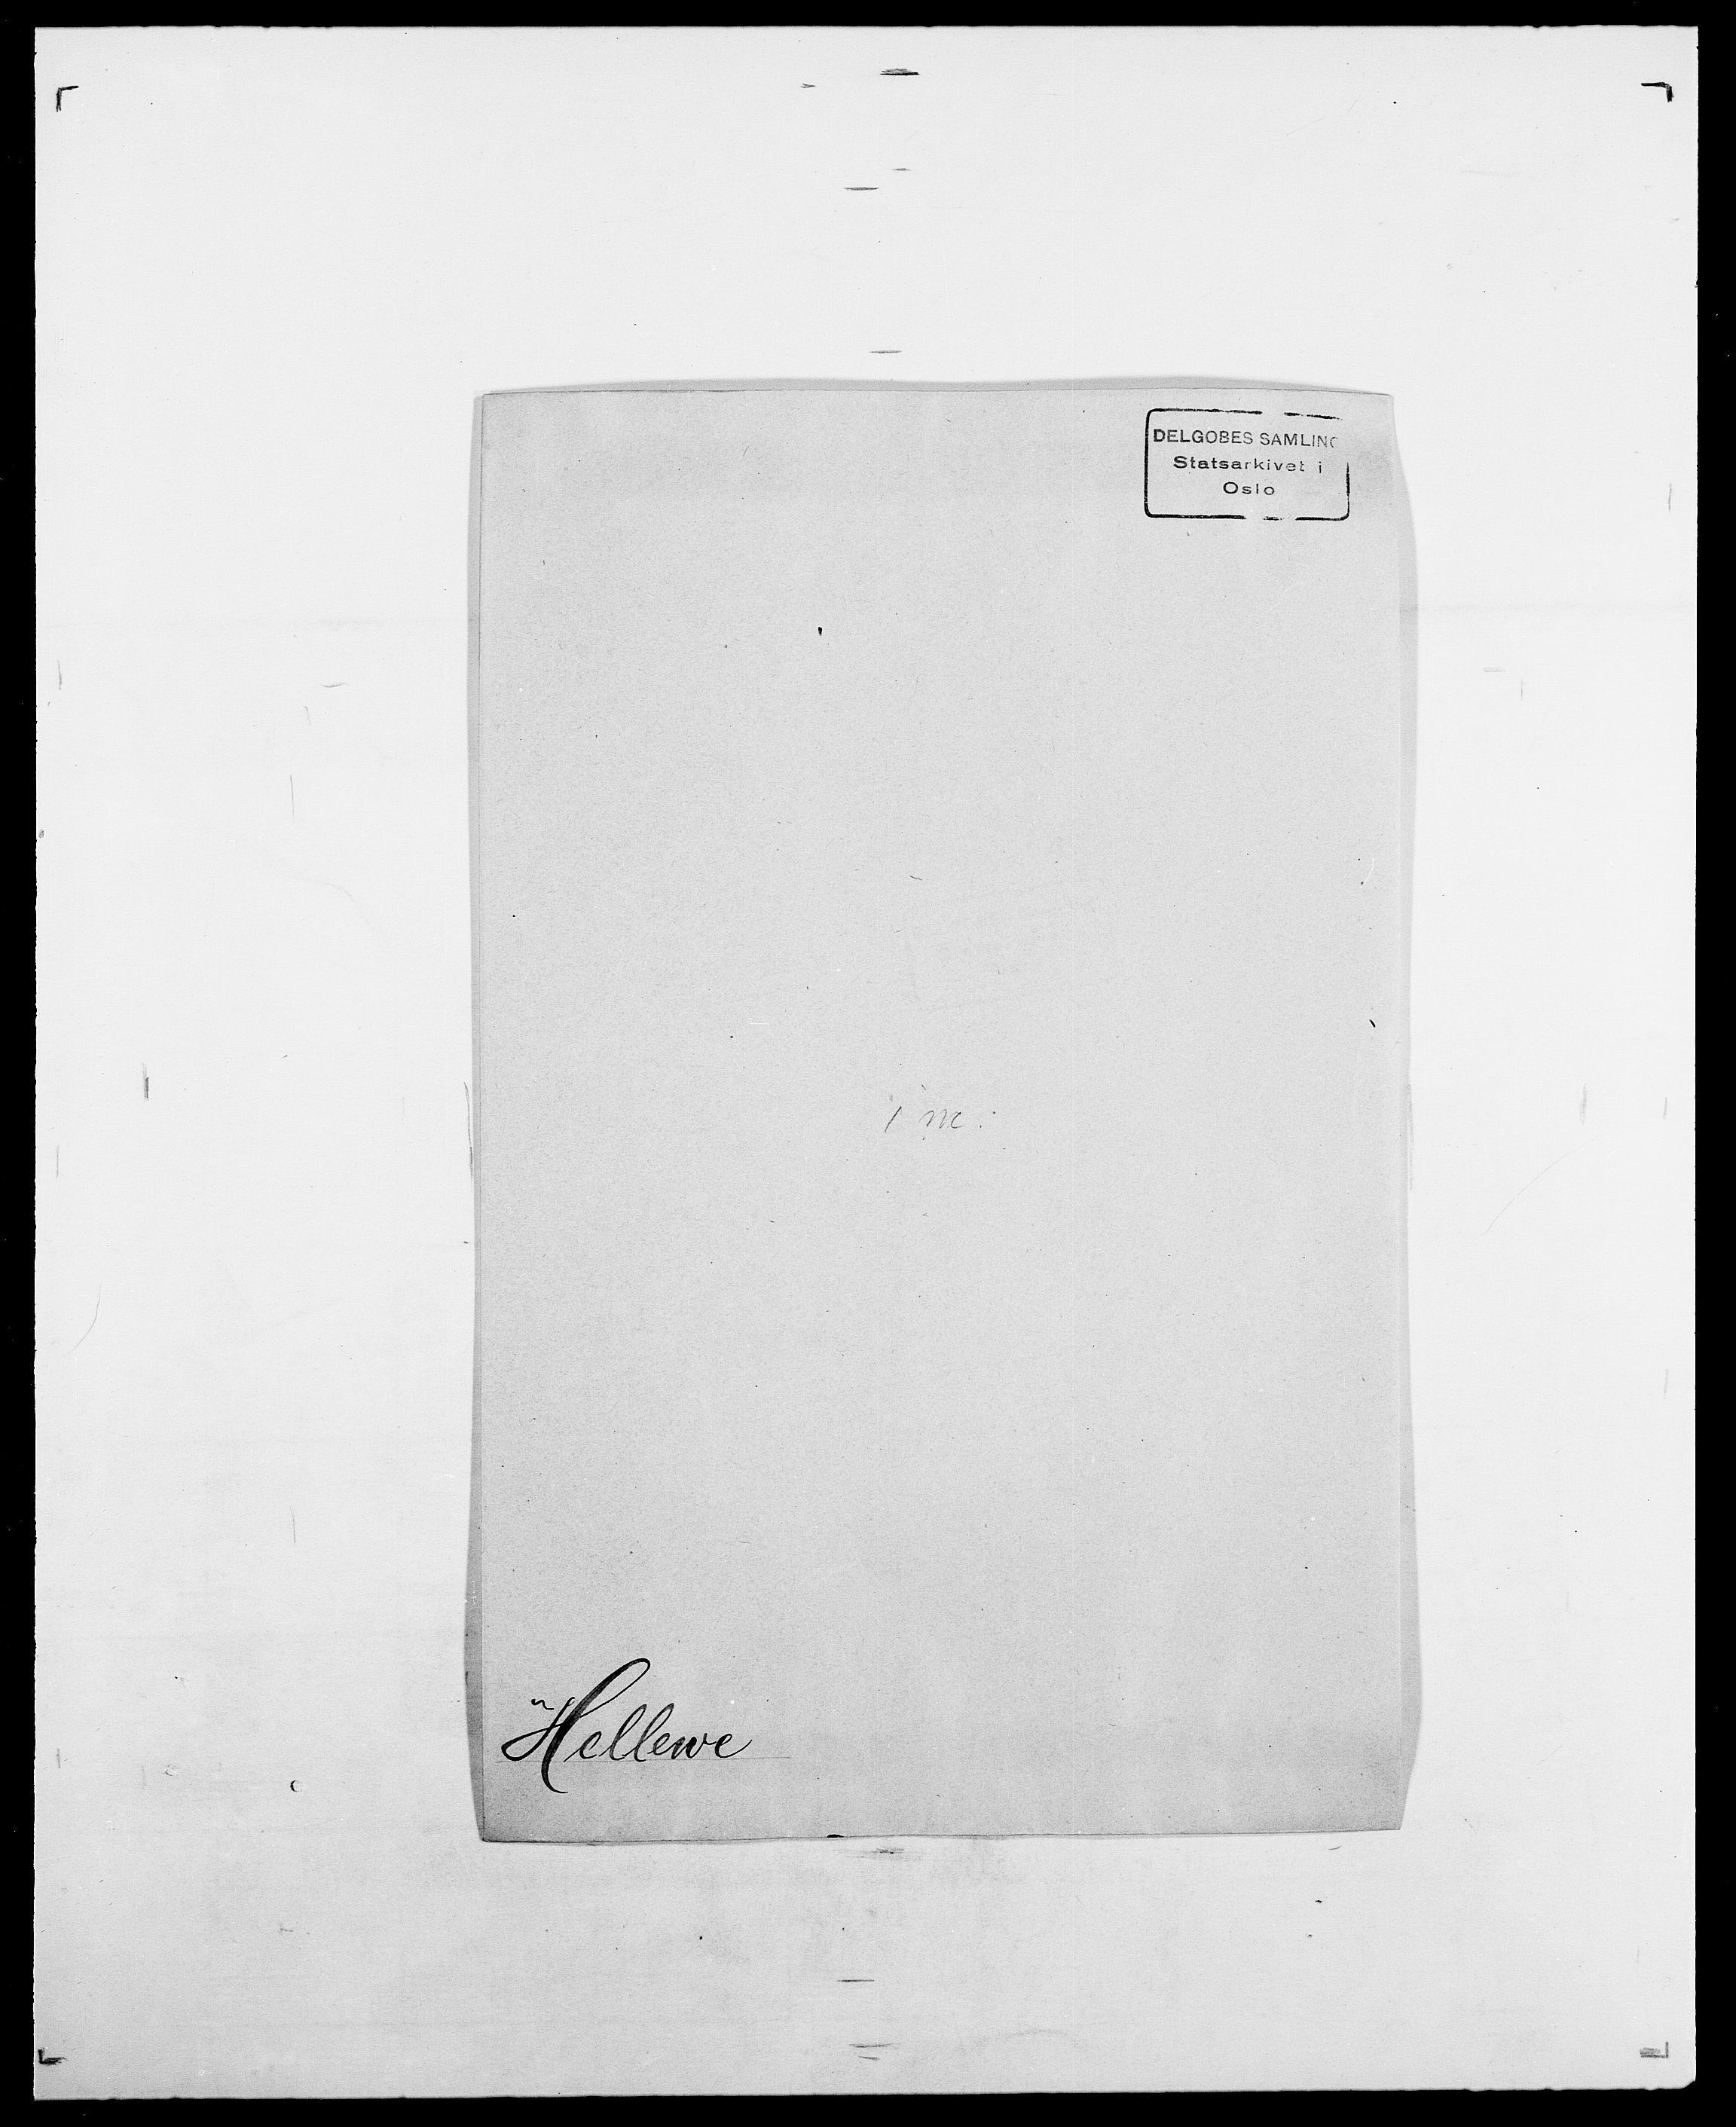 SAO, Delgobe, Charles Antoine - samling, D/Da/L0017: Helander - Hjørne, s. 78